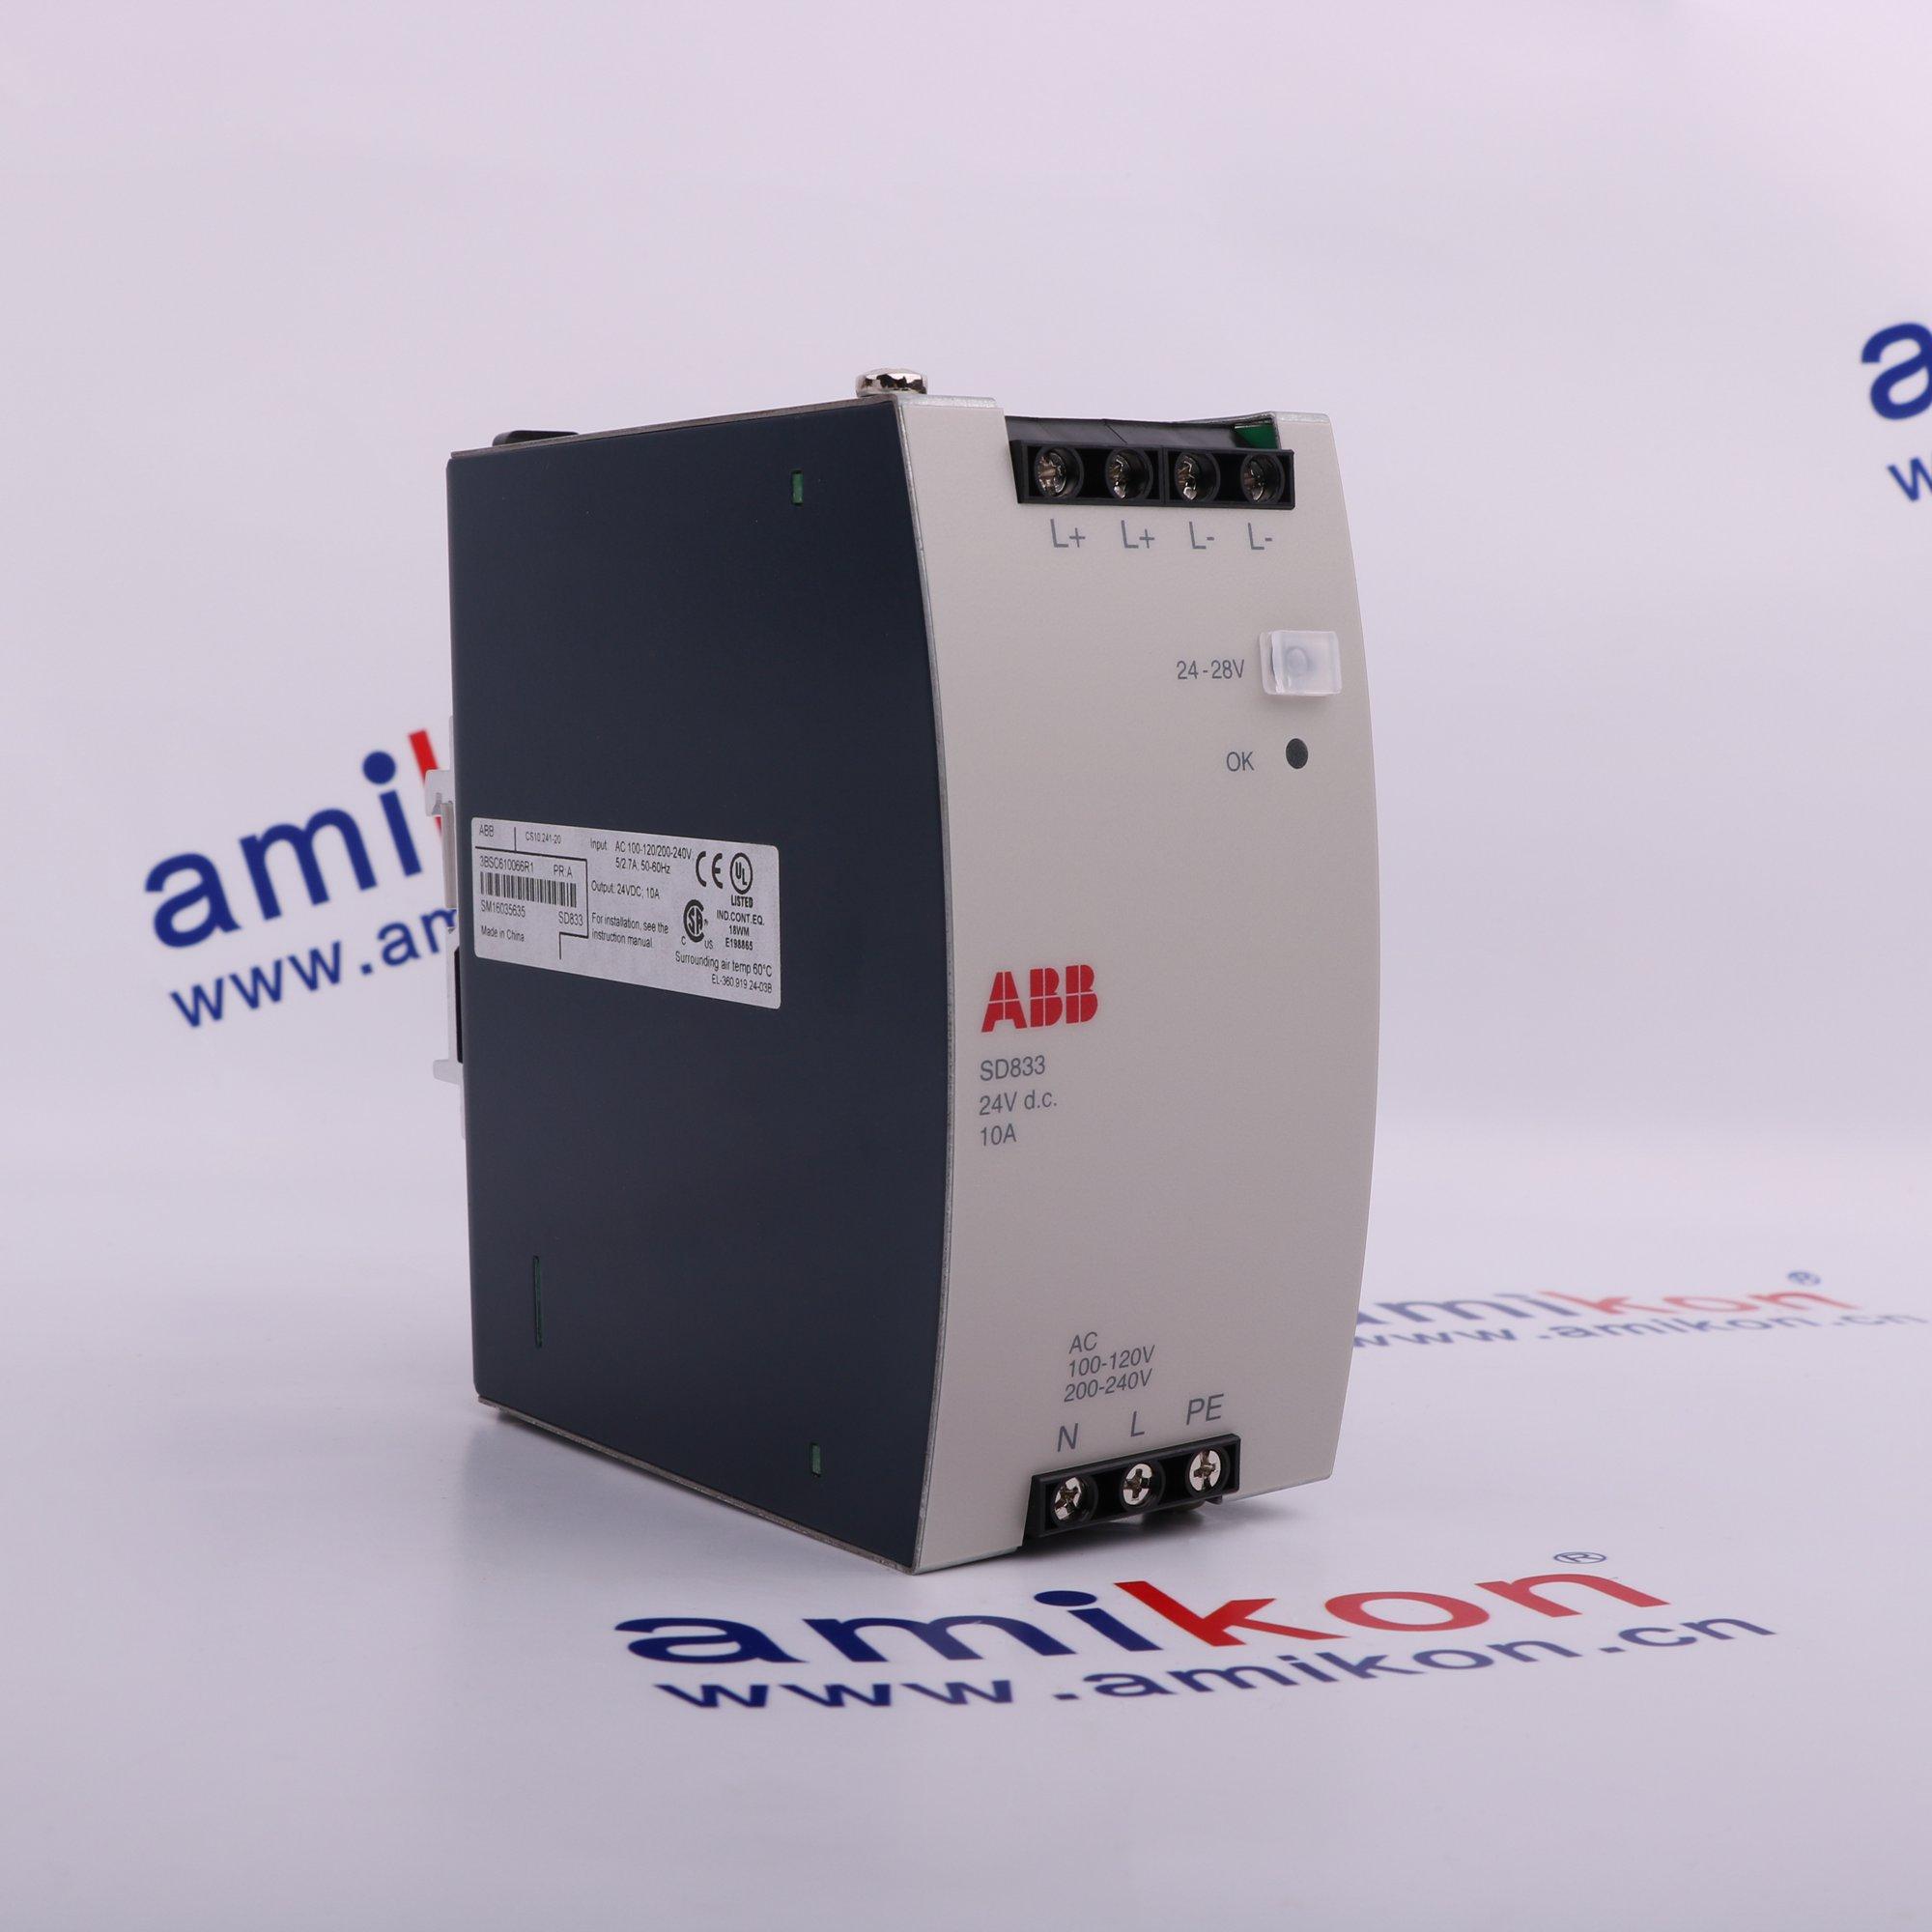 ABB SNAT603CNT SNAT 603 CNT (new and orignal) | Email me: saleaskplc.com(changeto@)